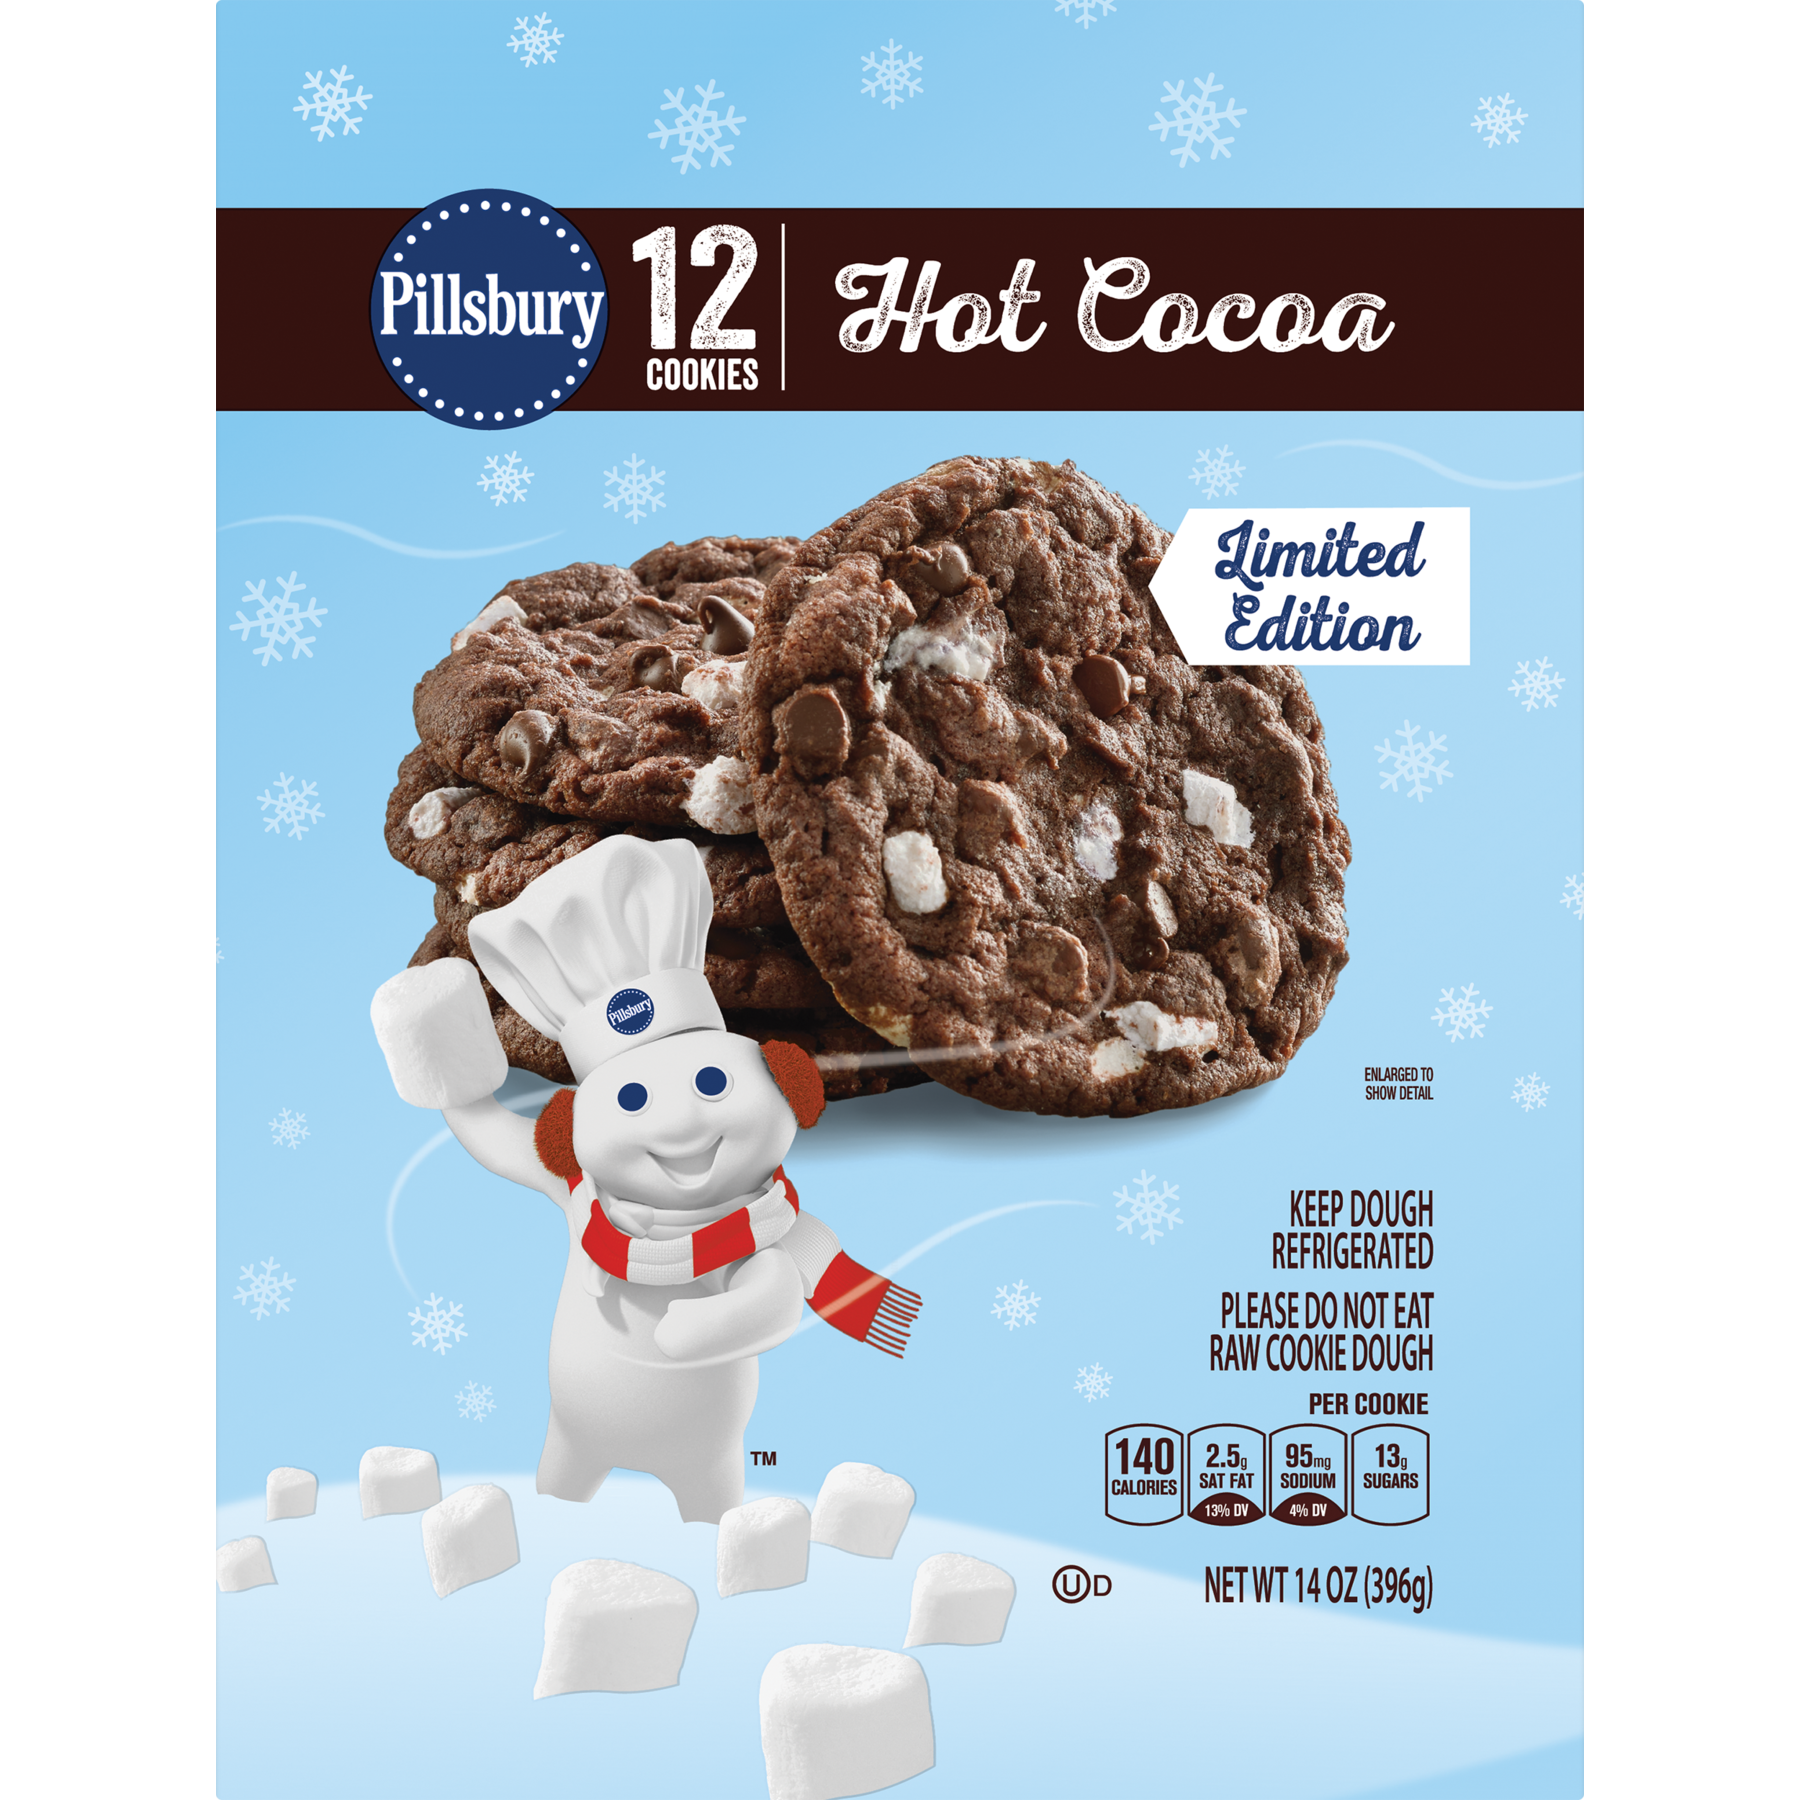 Pillsbury Limited Edition Hot Cocoa RTB